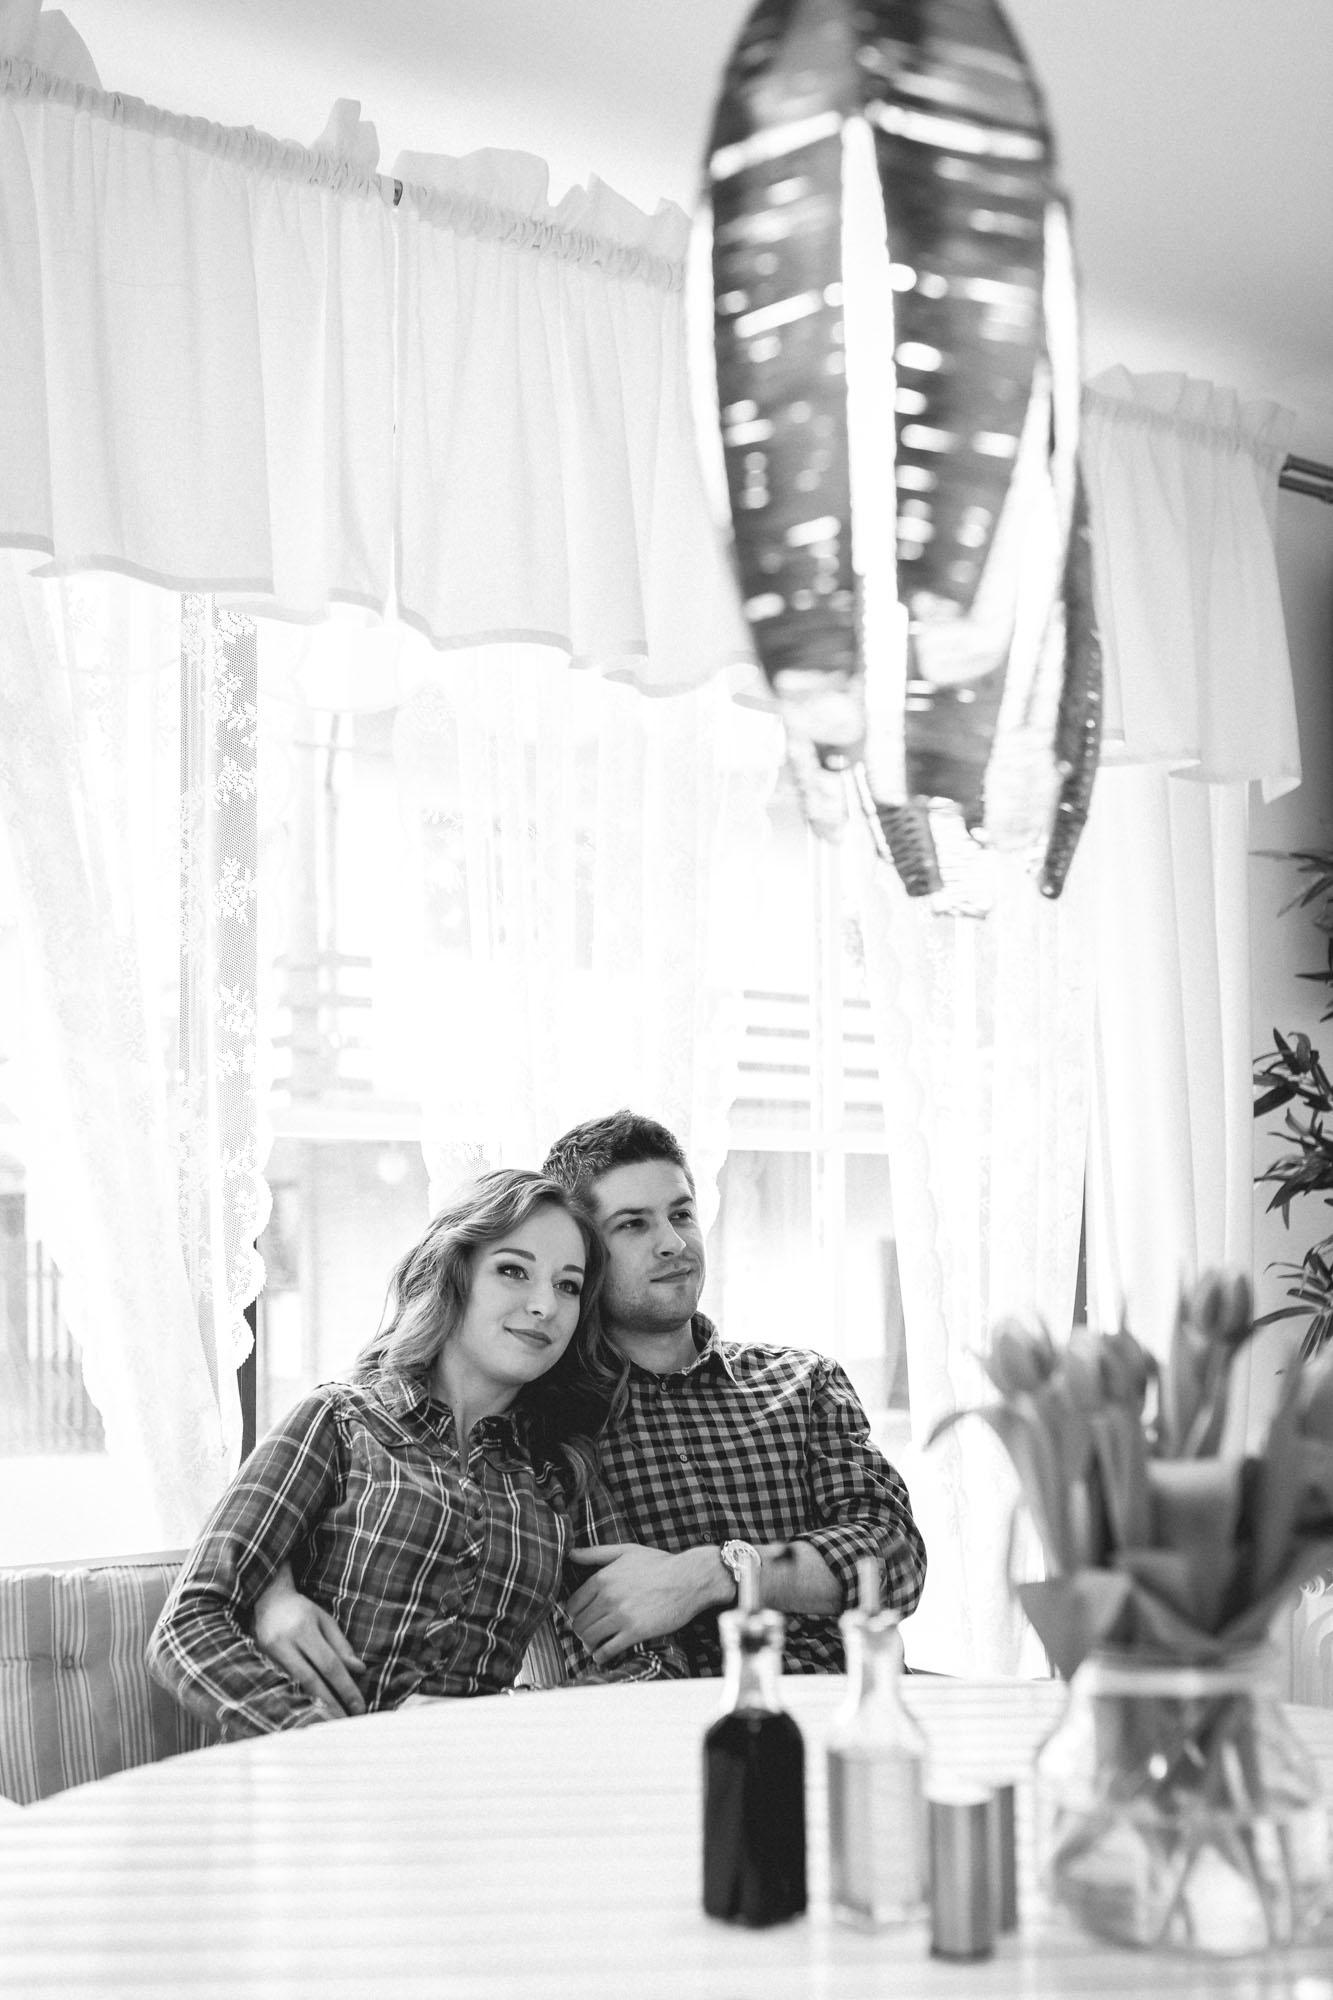 20150423 12-20-11 Justyna i Tomasz